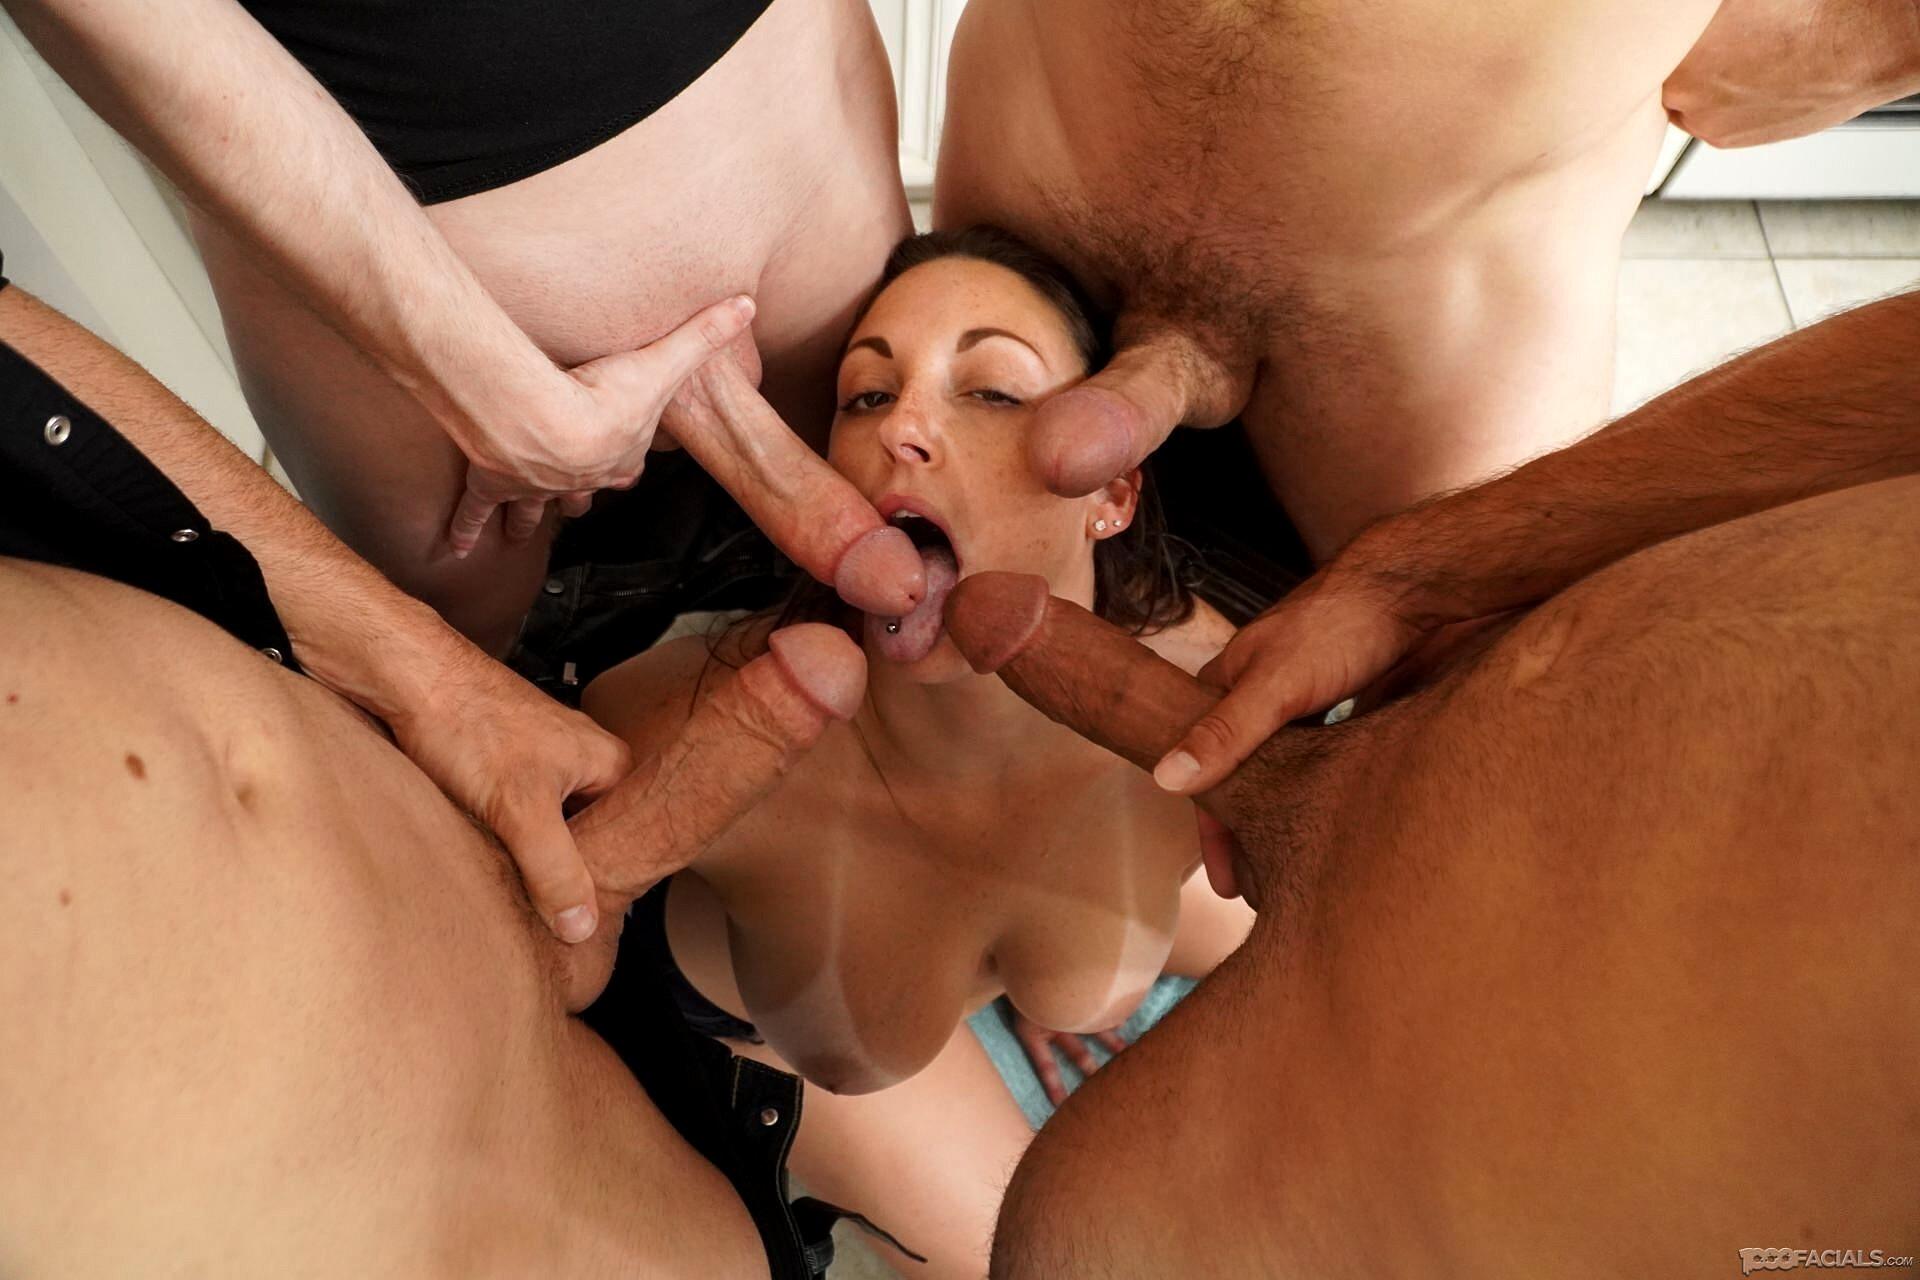 Amazing Stripper Facial Porn asiancandyxx ball sucking xnxx amazing! melanie hicks 1000